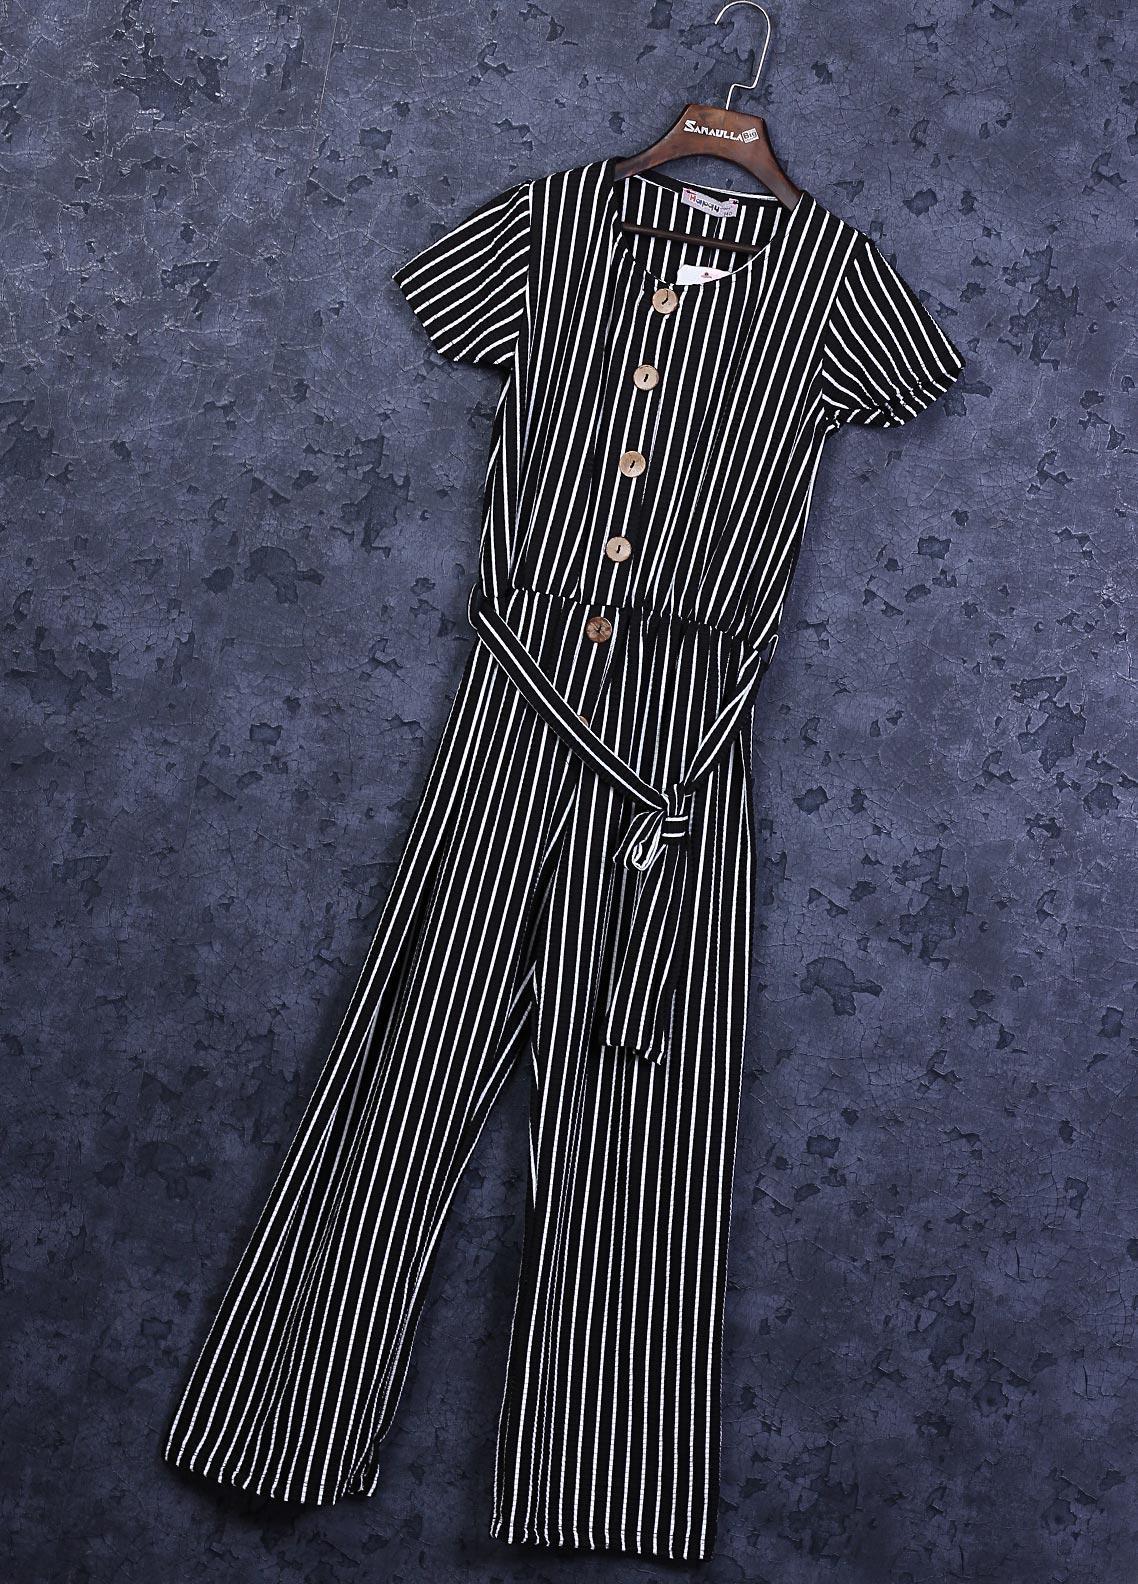 Sanaulla Exclusive Range Crepe Fancy Girls Maxi -  22927 Black